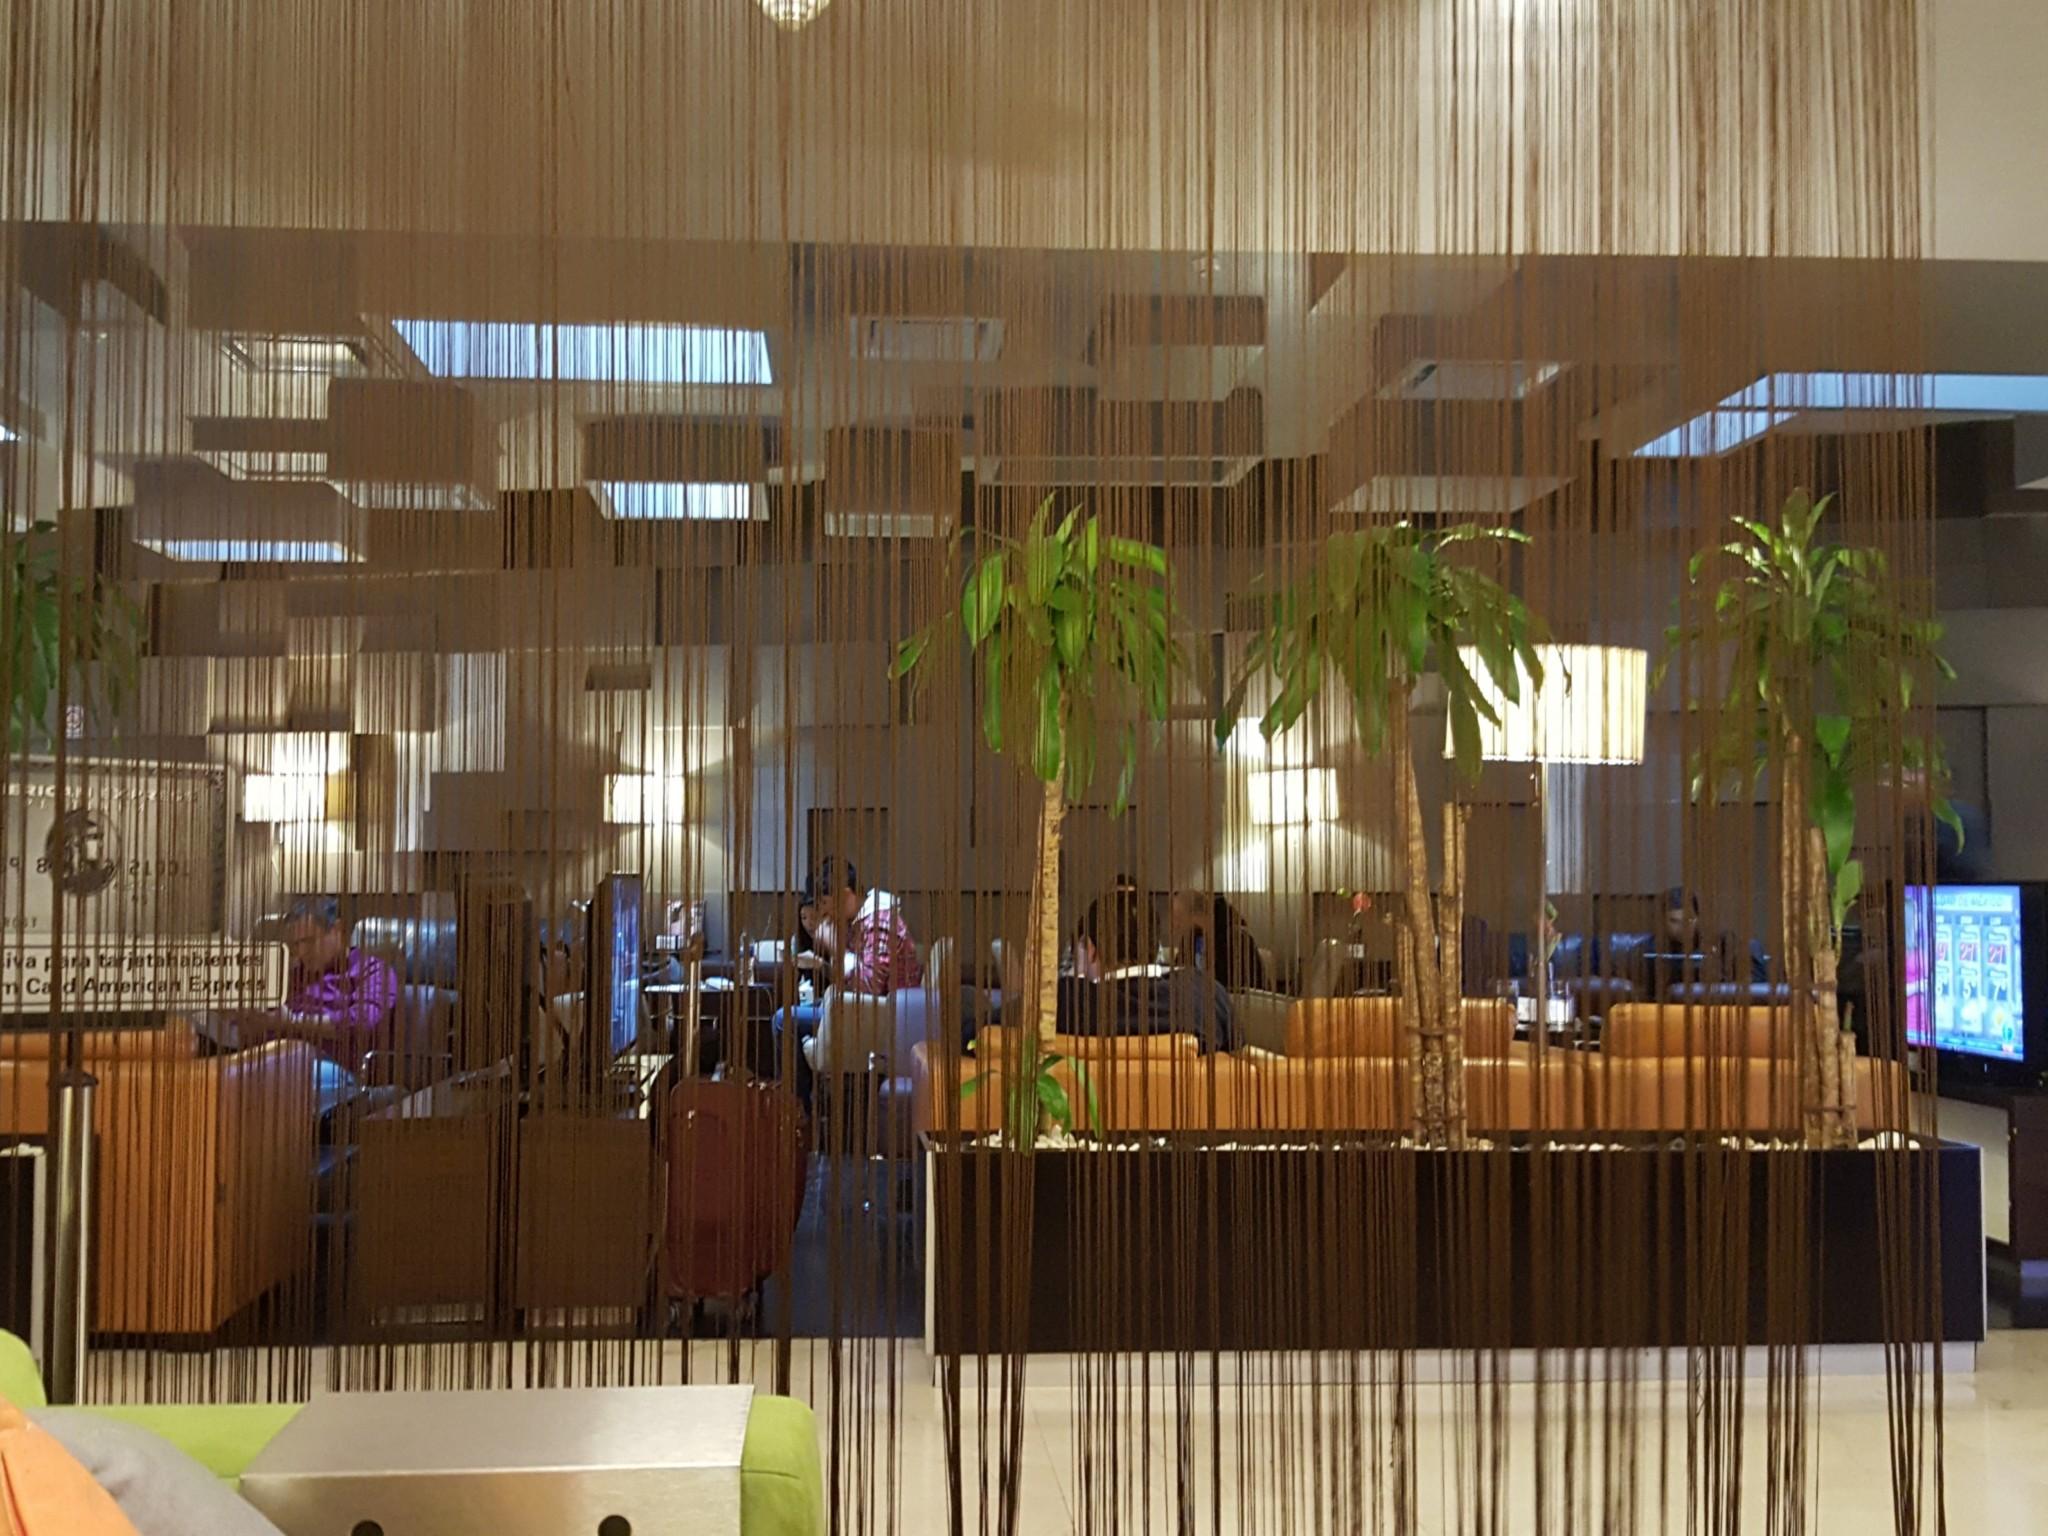 centurion lounge mexico city t1114716 viajero millero. Black Bedroom Furniture Sets. Home Design Ideas